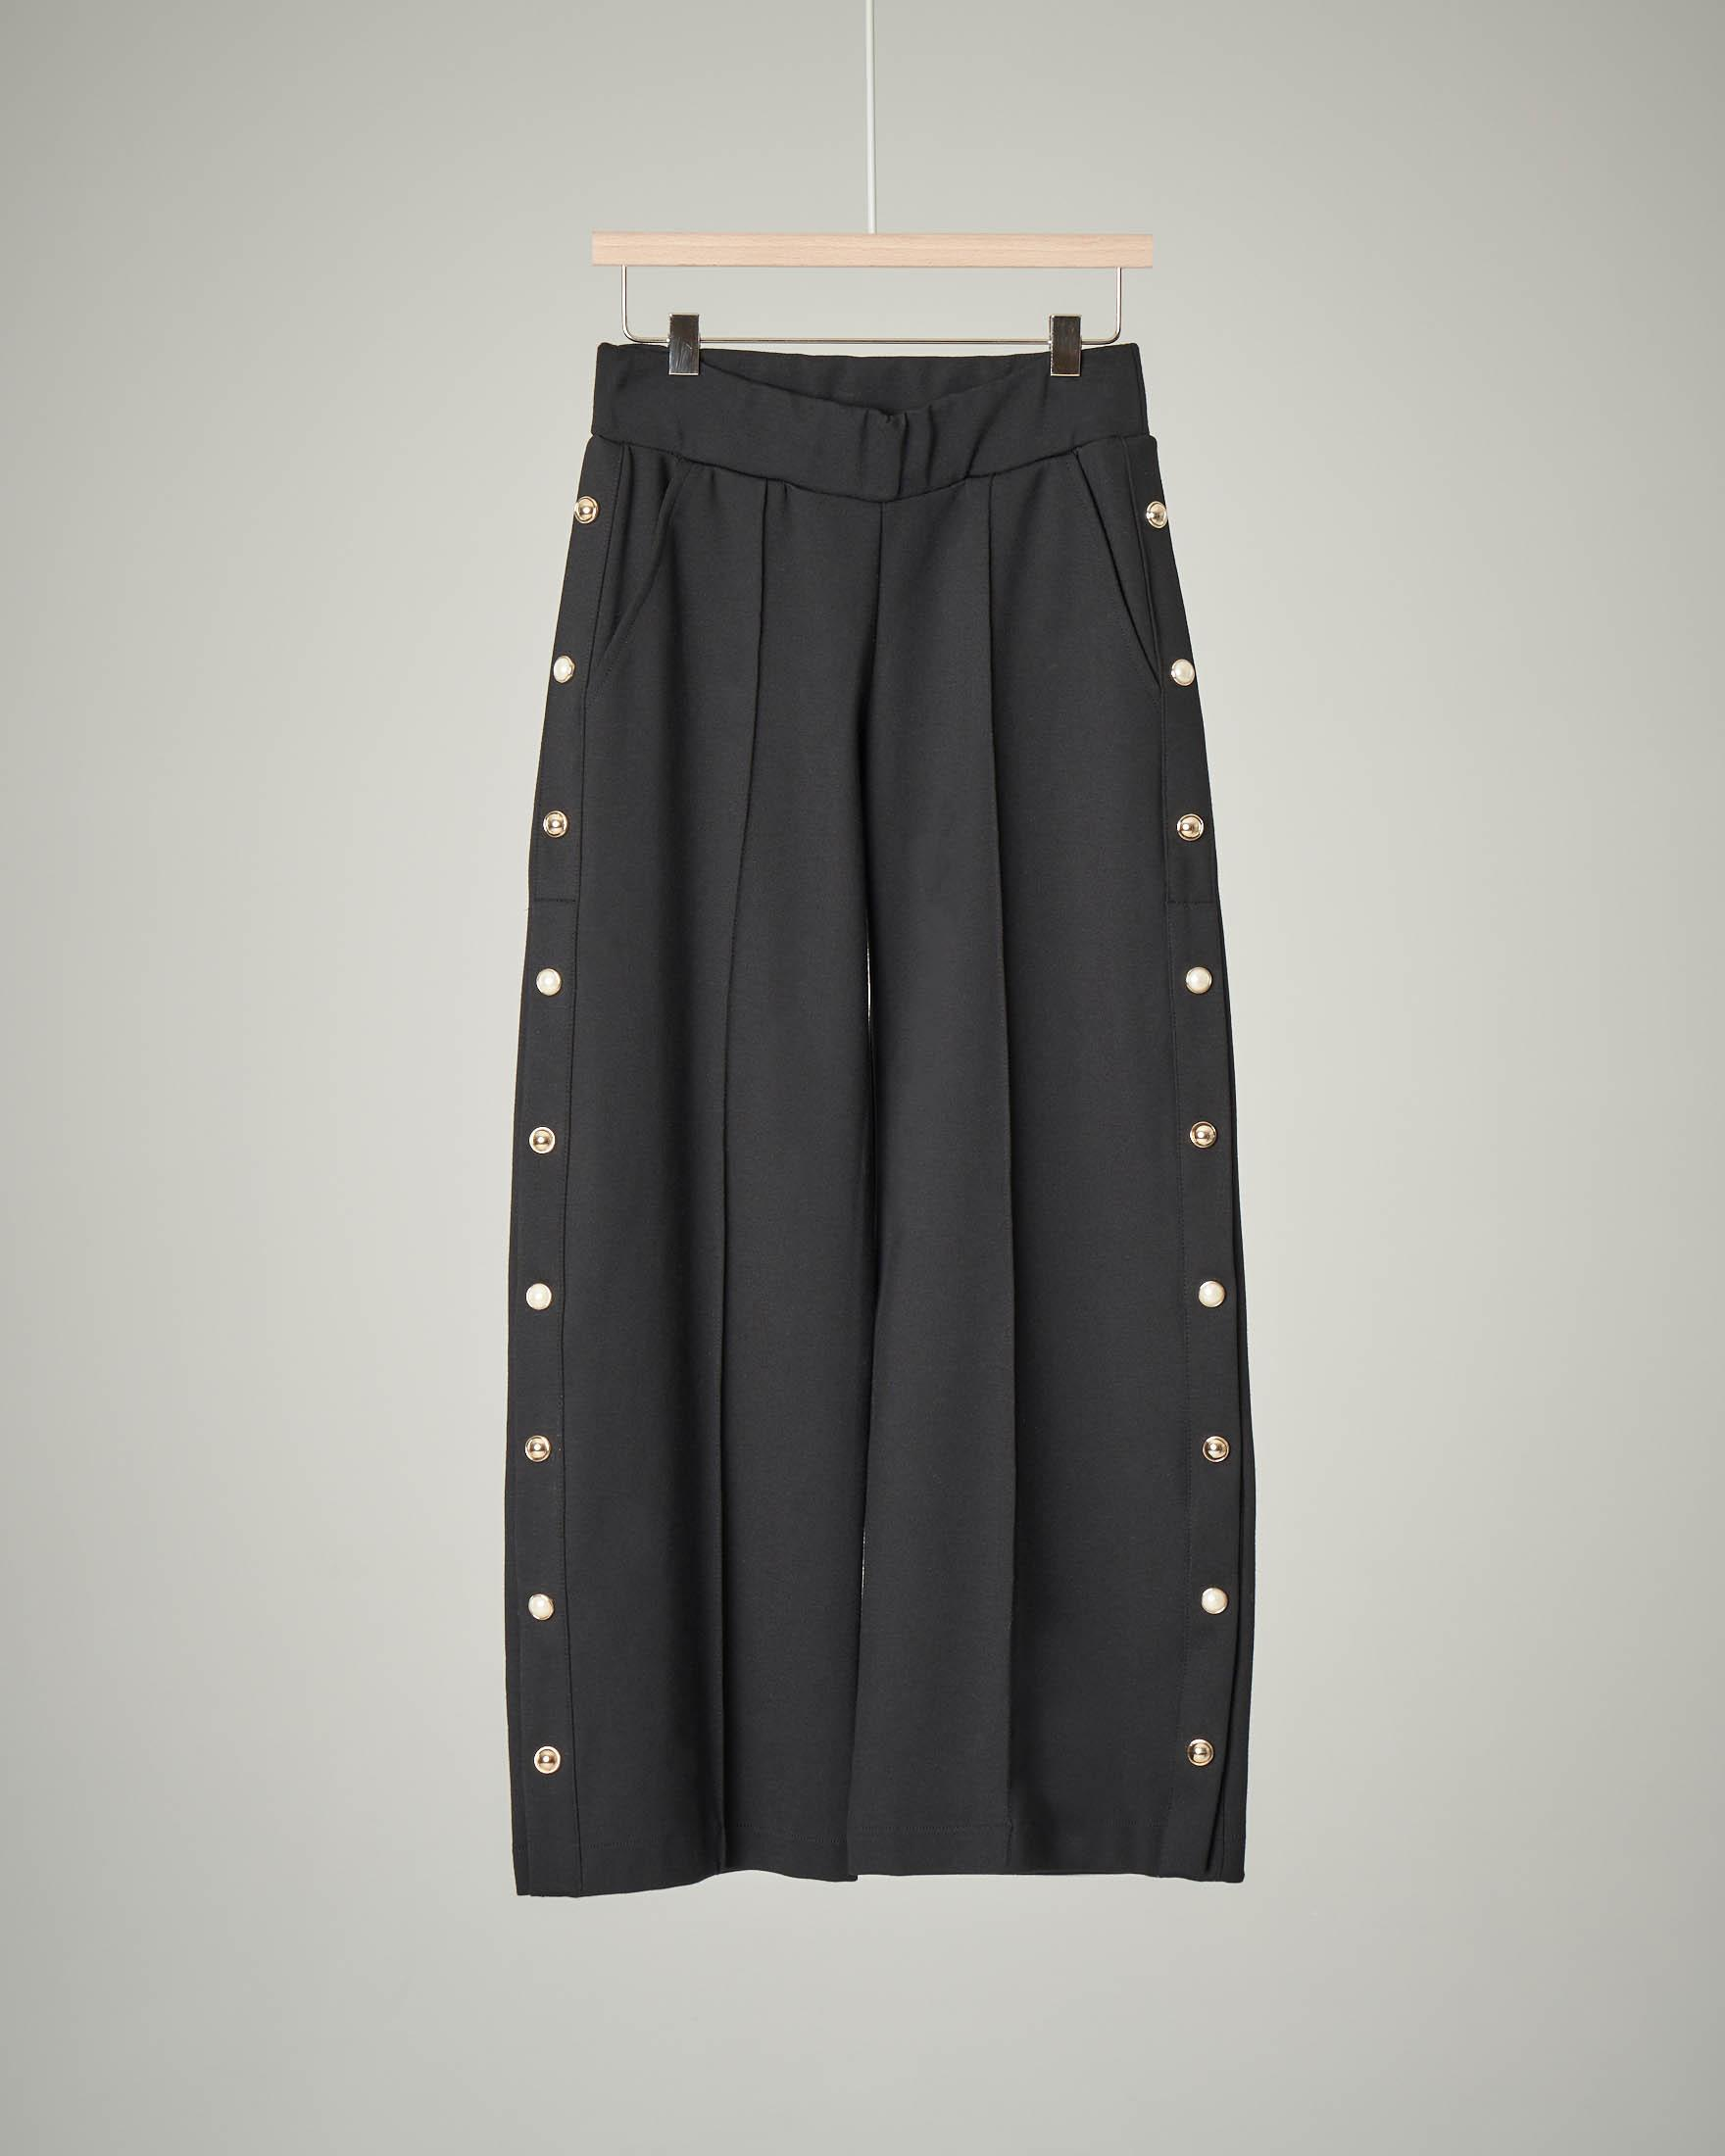 Pantalone nero palazzo con bottoni sui fianchi 40-46